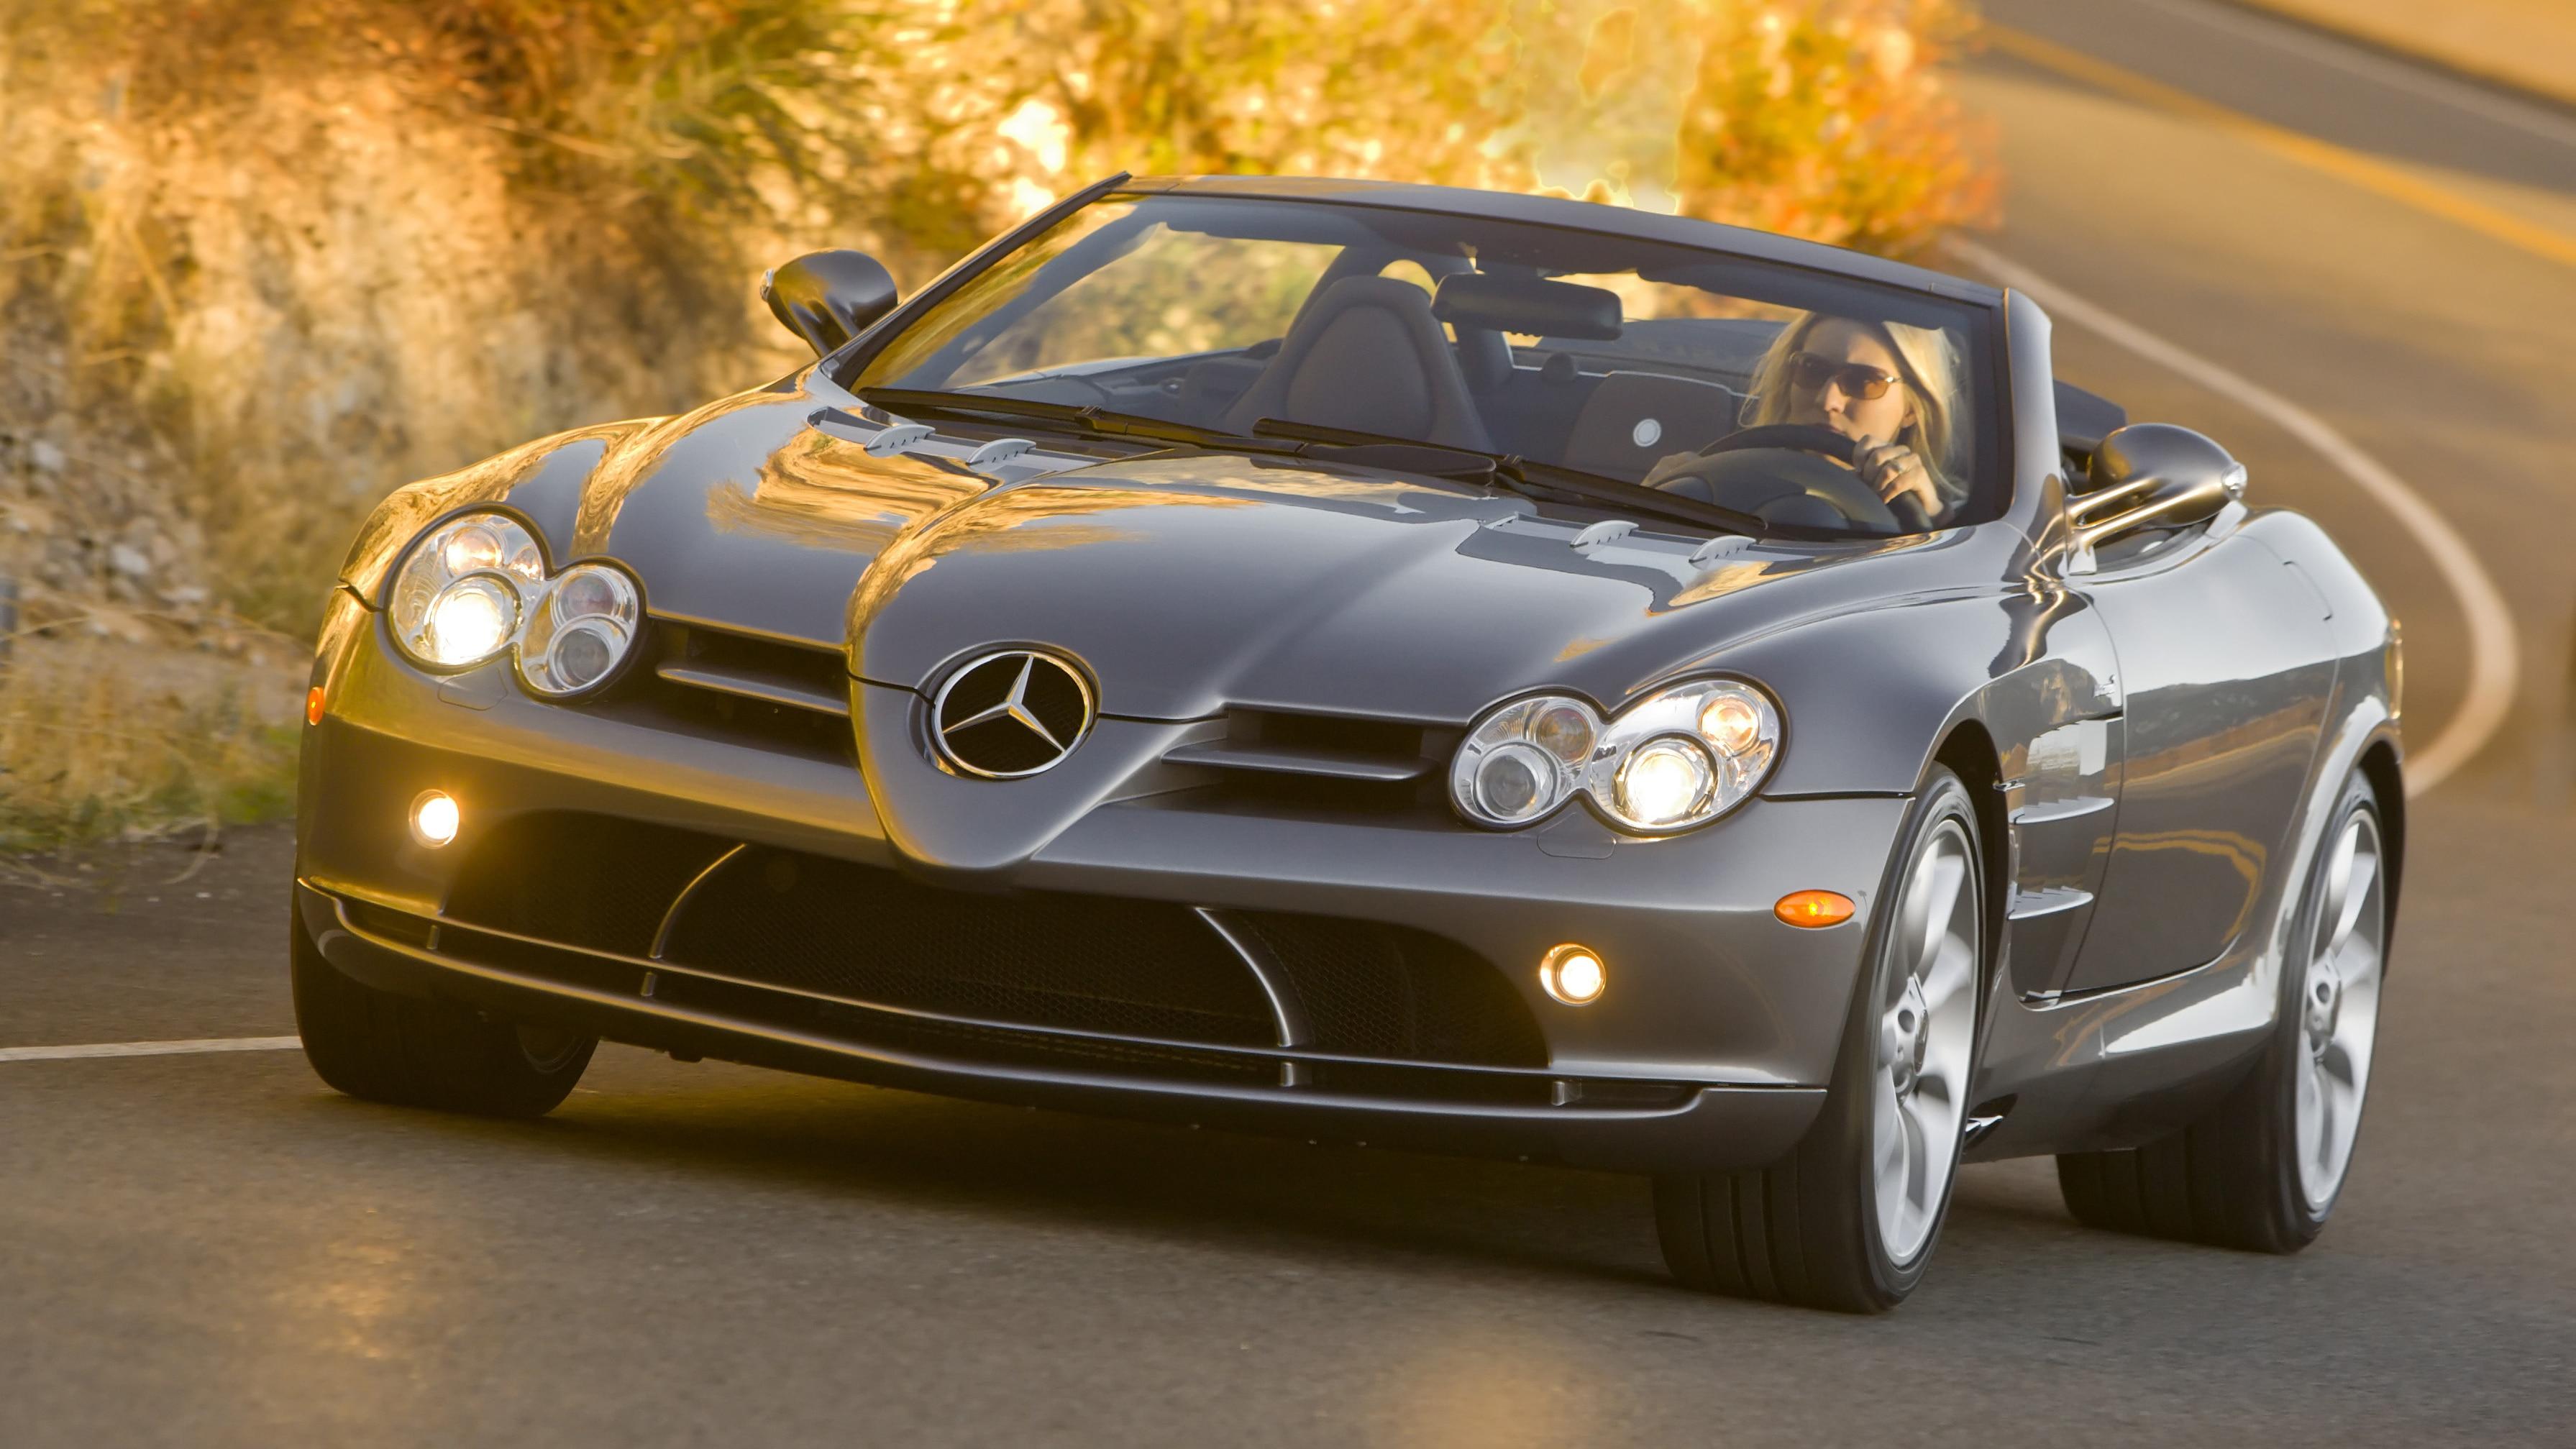 2008 Mercedes Benz Slr Mclaren Roadster Latest News Features And